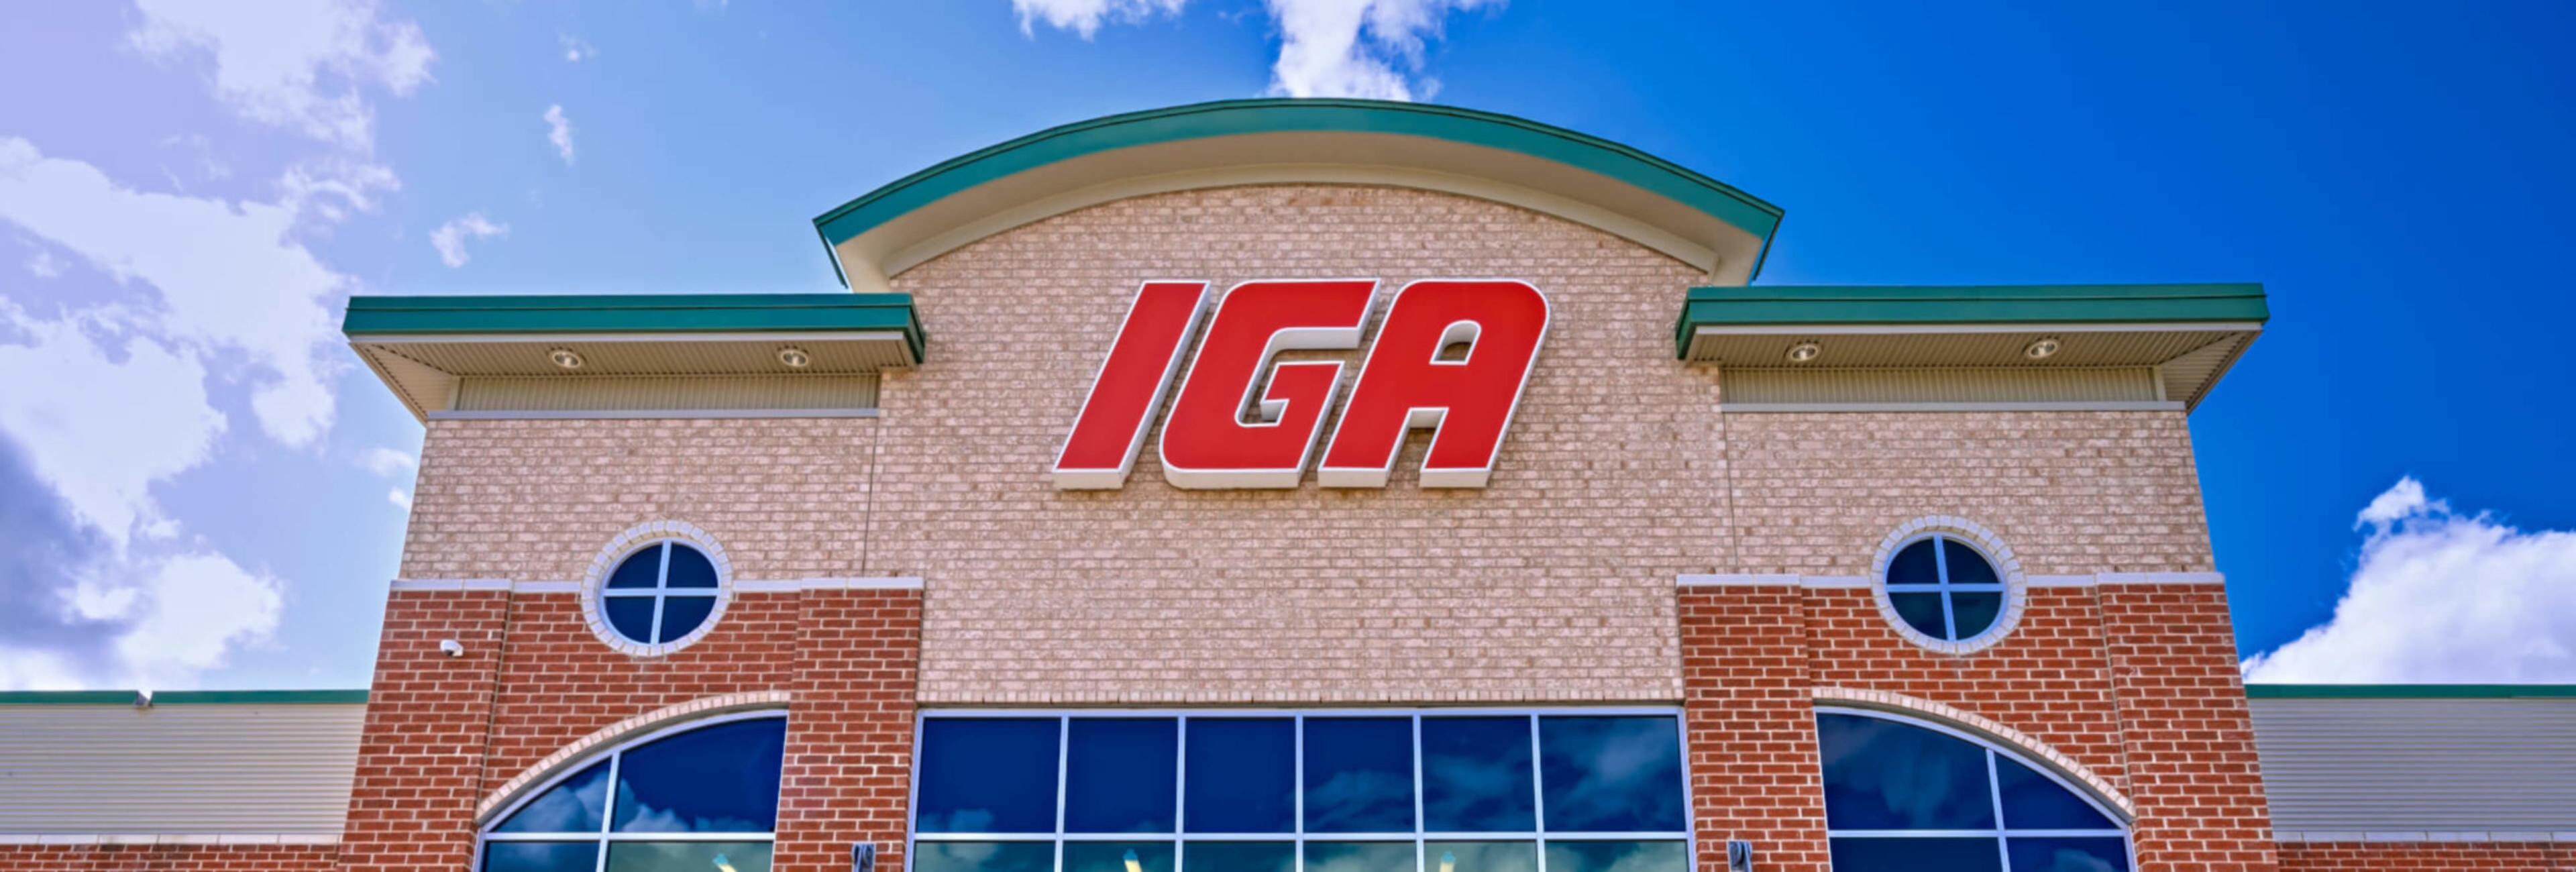 Skyline Retail REIT - IGA